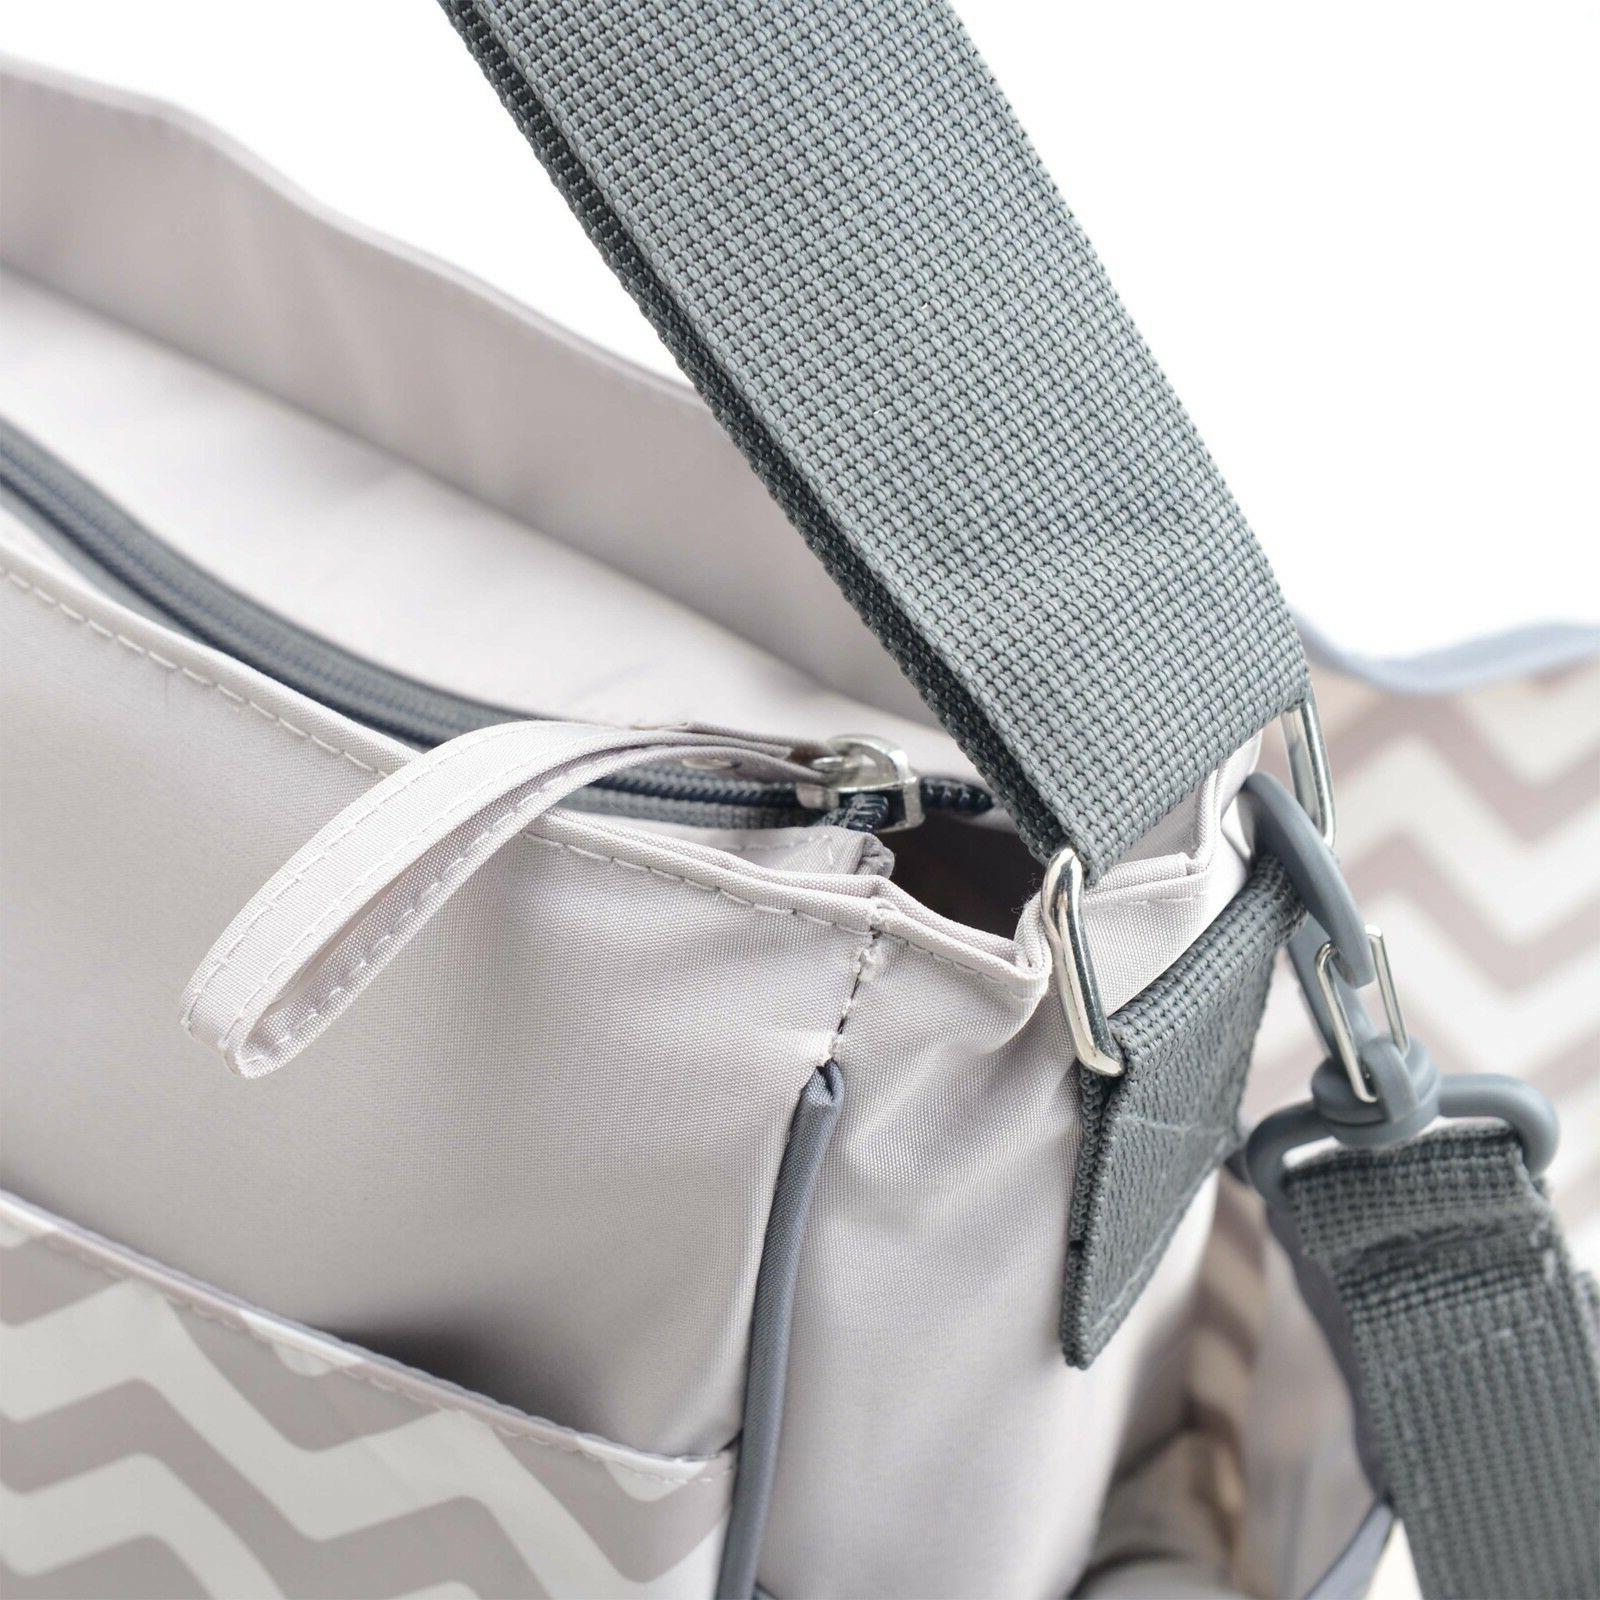 Diaper Multi-Function Waterproof Bag Bags for Baby